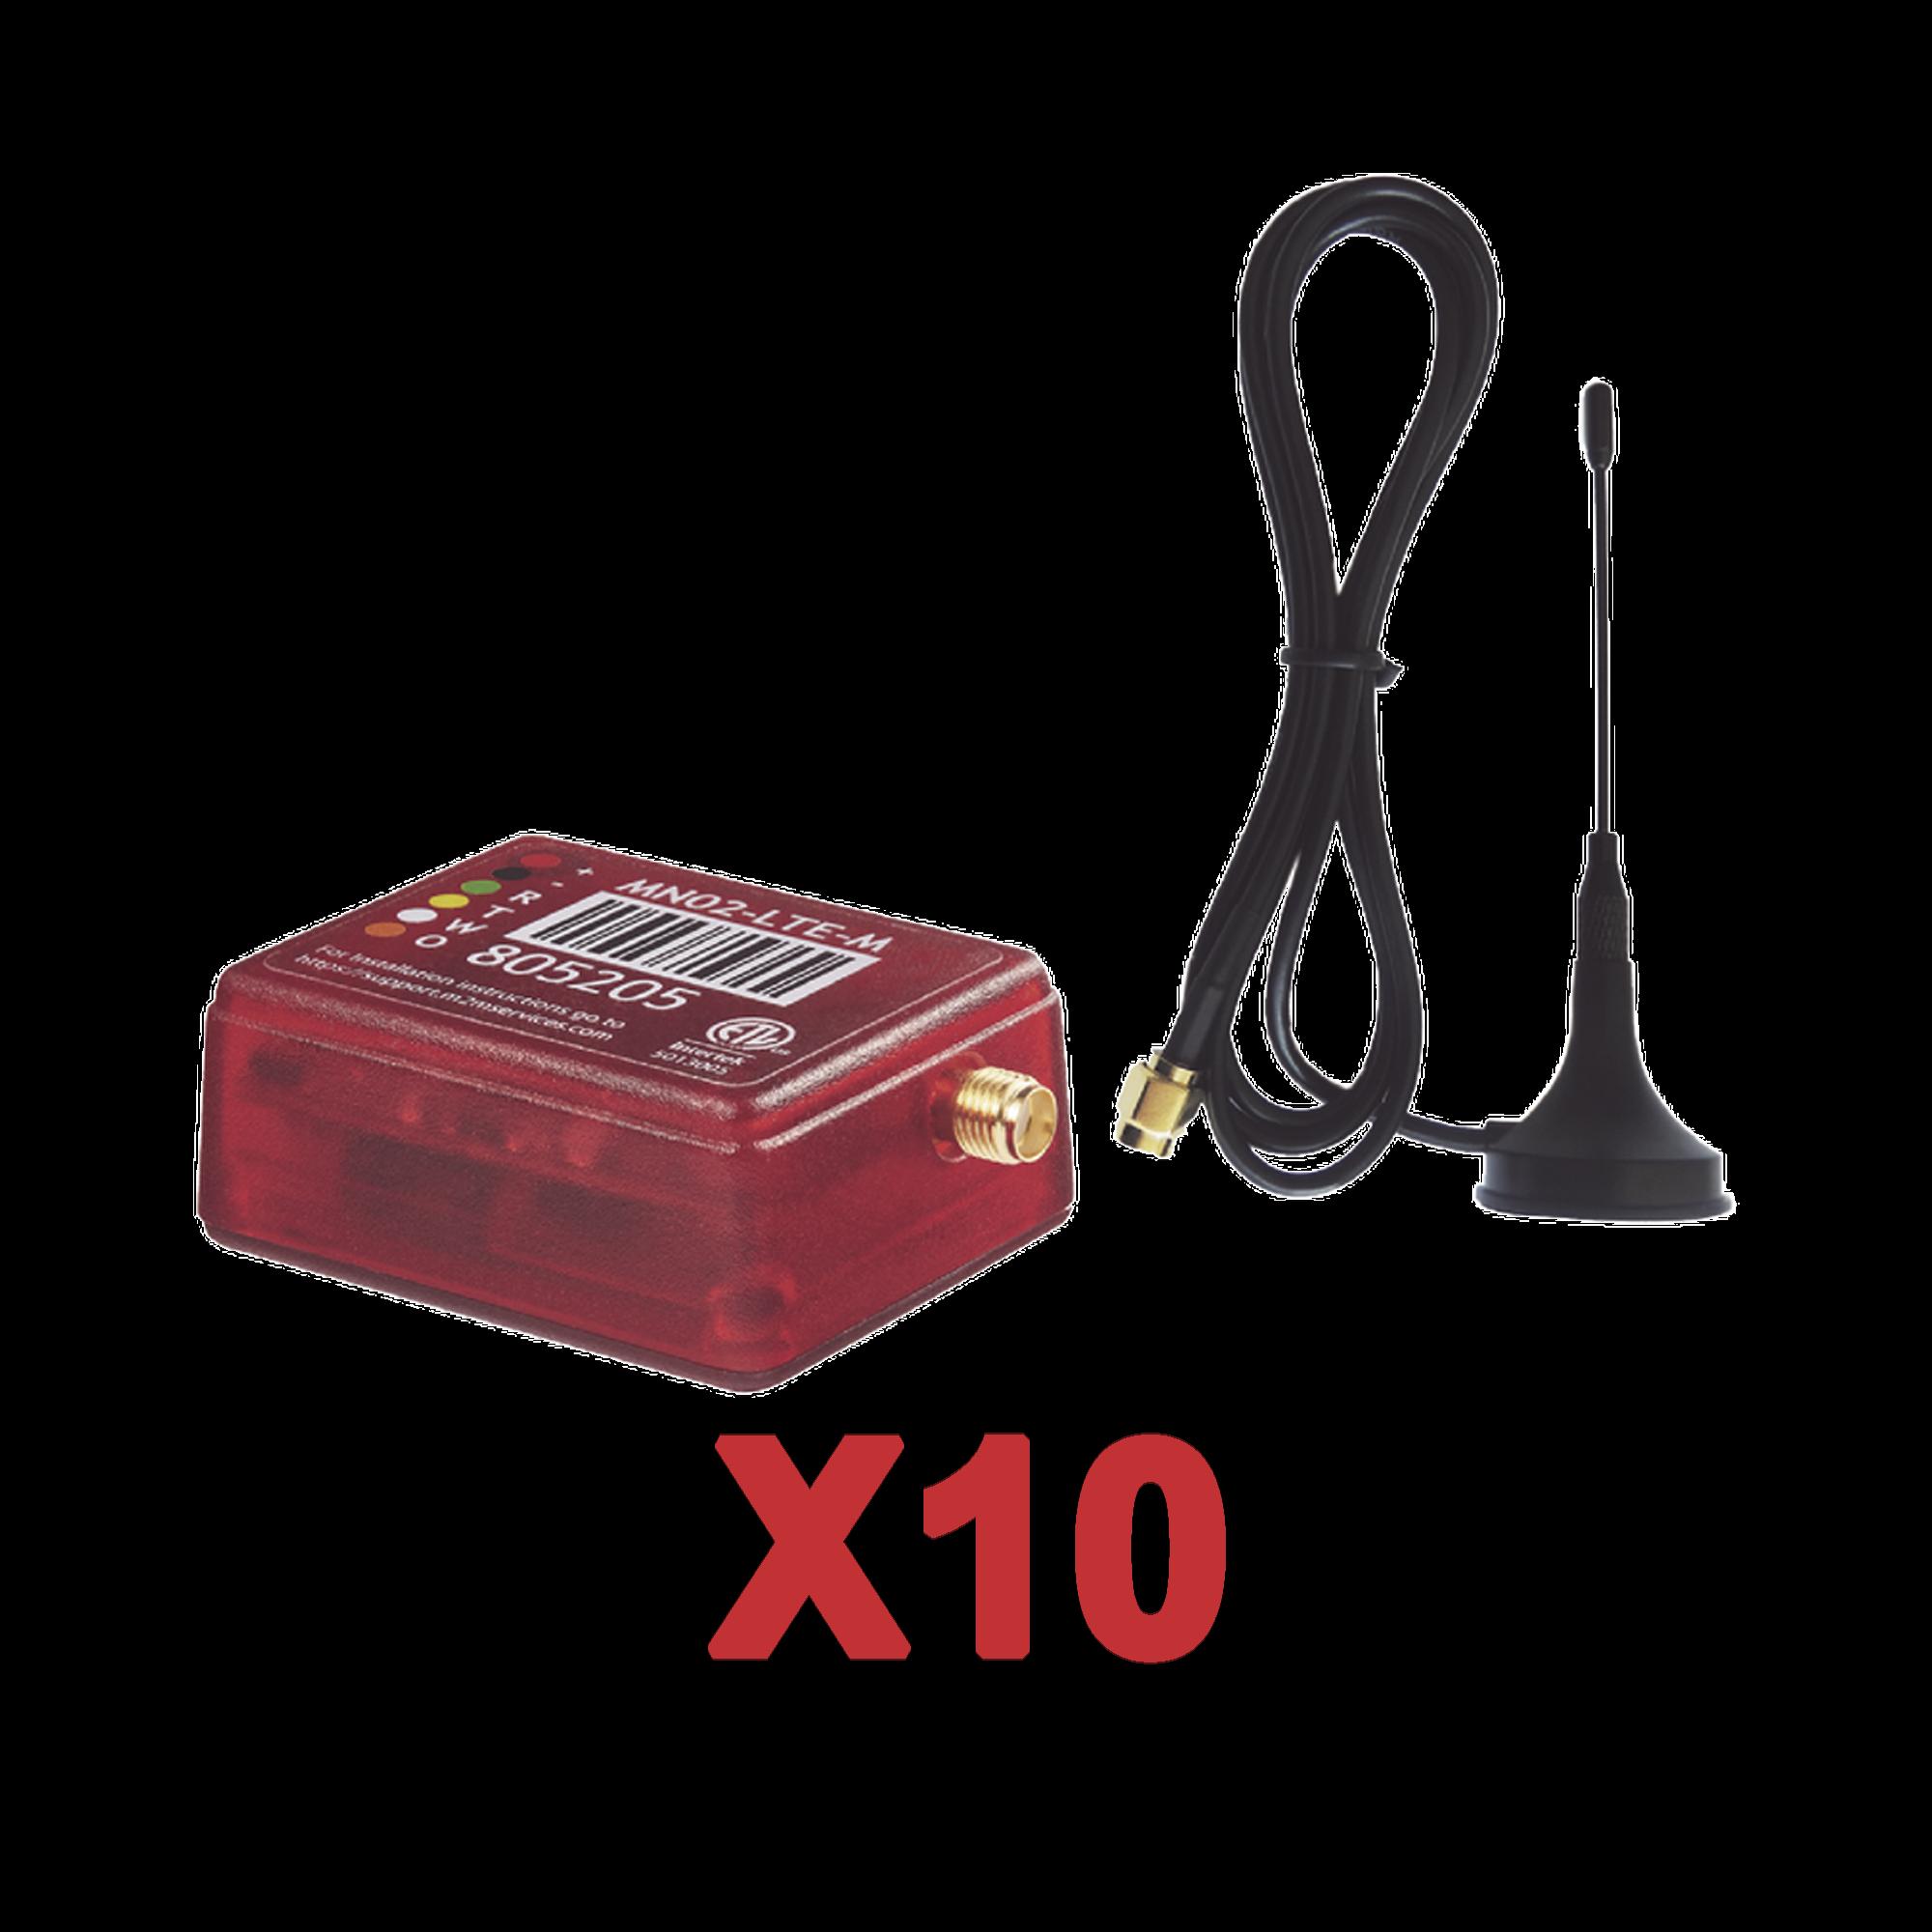 KIt de 10 Comunicadores de Alarma MN02LTEM con Antena 4GLTEM and 5G / Incluyen 2 A�os de Cobertura / Aplicacion Gratuita / Cero Configuracion / Compatible Honeywell/DSC/CROW/PIMA